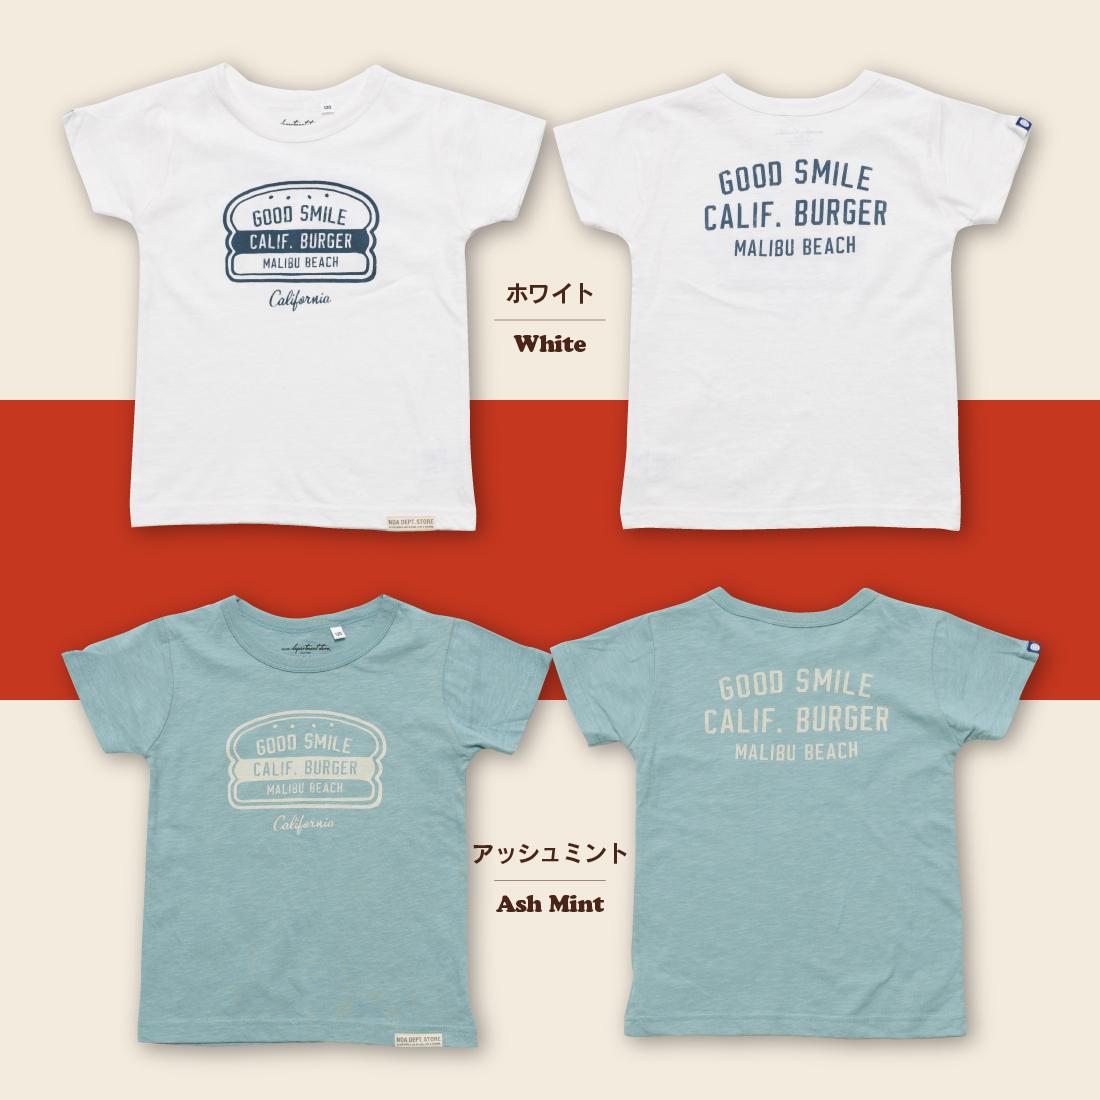 noa department store. Holidaysシリーズ GOOD SMILE Tシャツ(80cm 90cm 100cm 110cm 120cm 130cm 140cm 150cm)子供服 半袖 Tシャツ